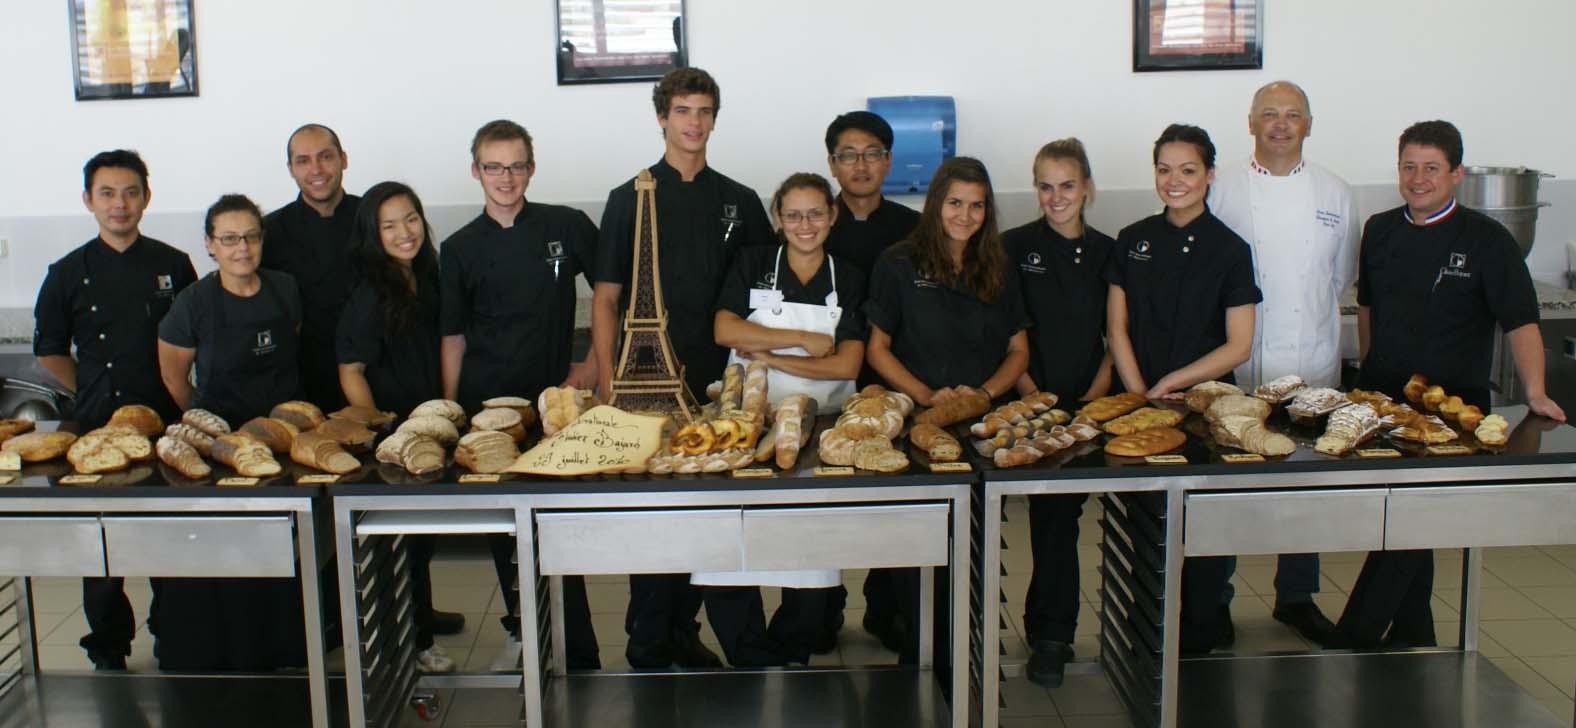 Crispy news pains et viennoiseries chez olivier bajard for Zimmermann cuisinier